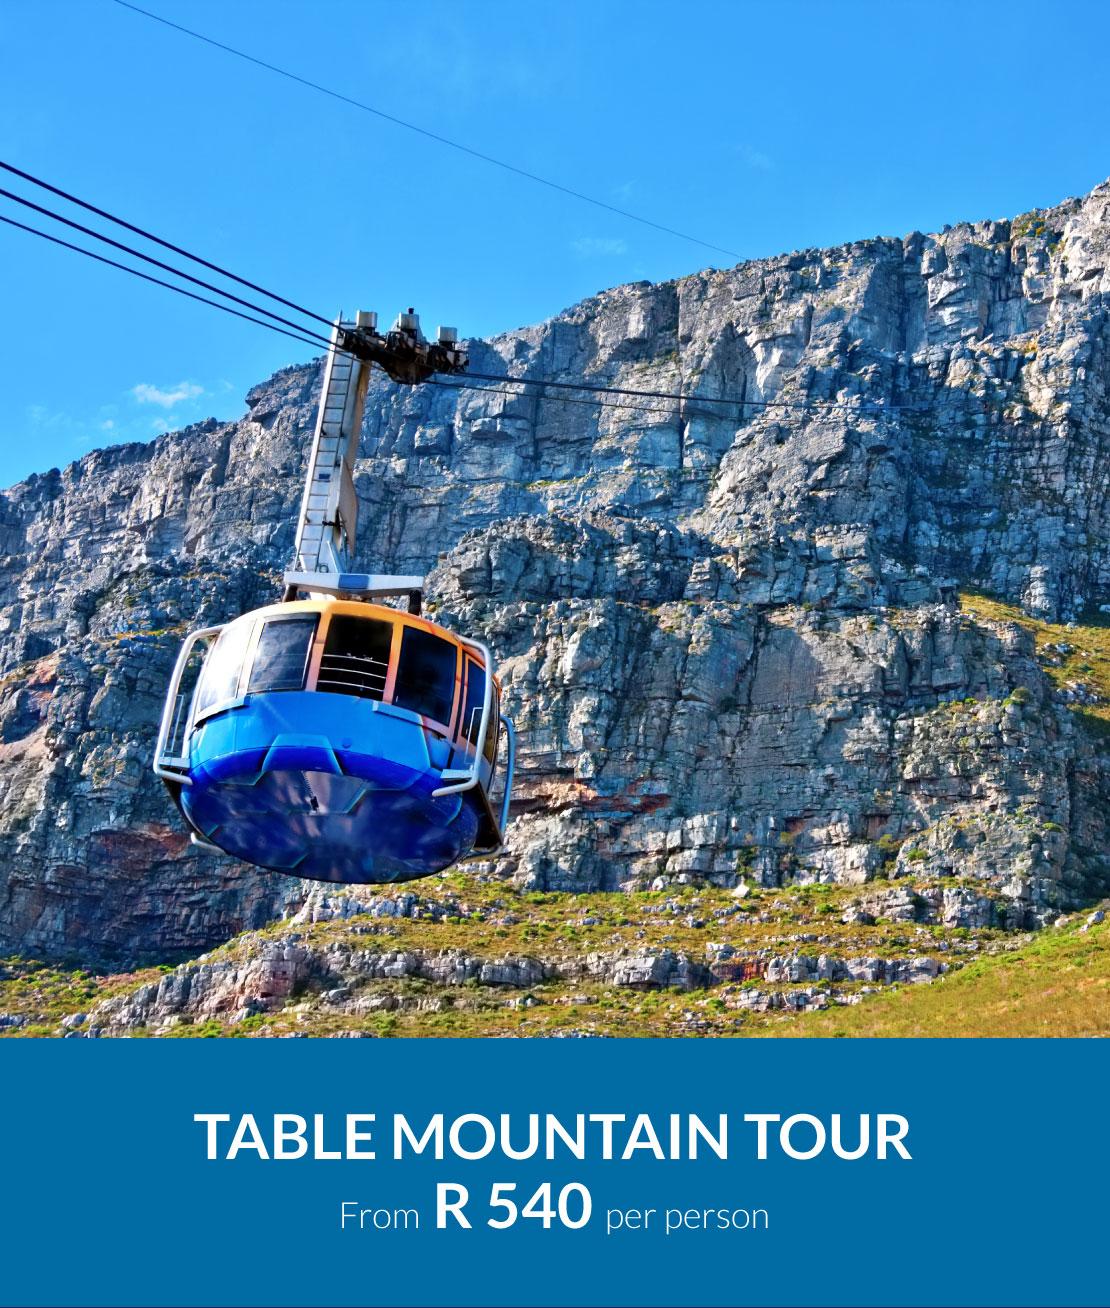 mouille-point-village-mountain-tours